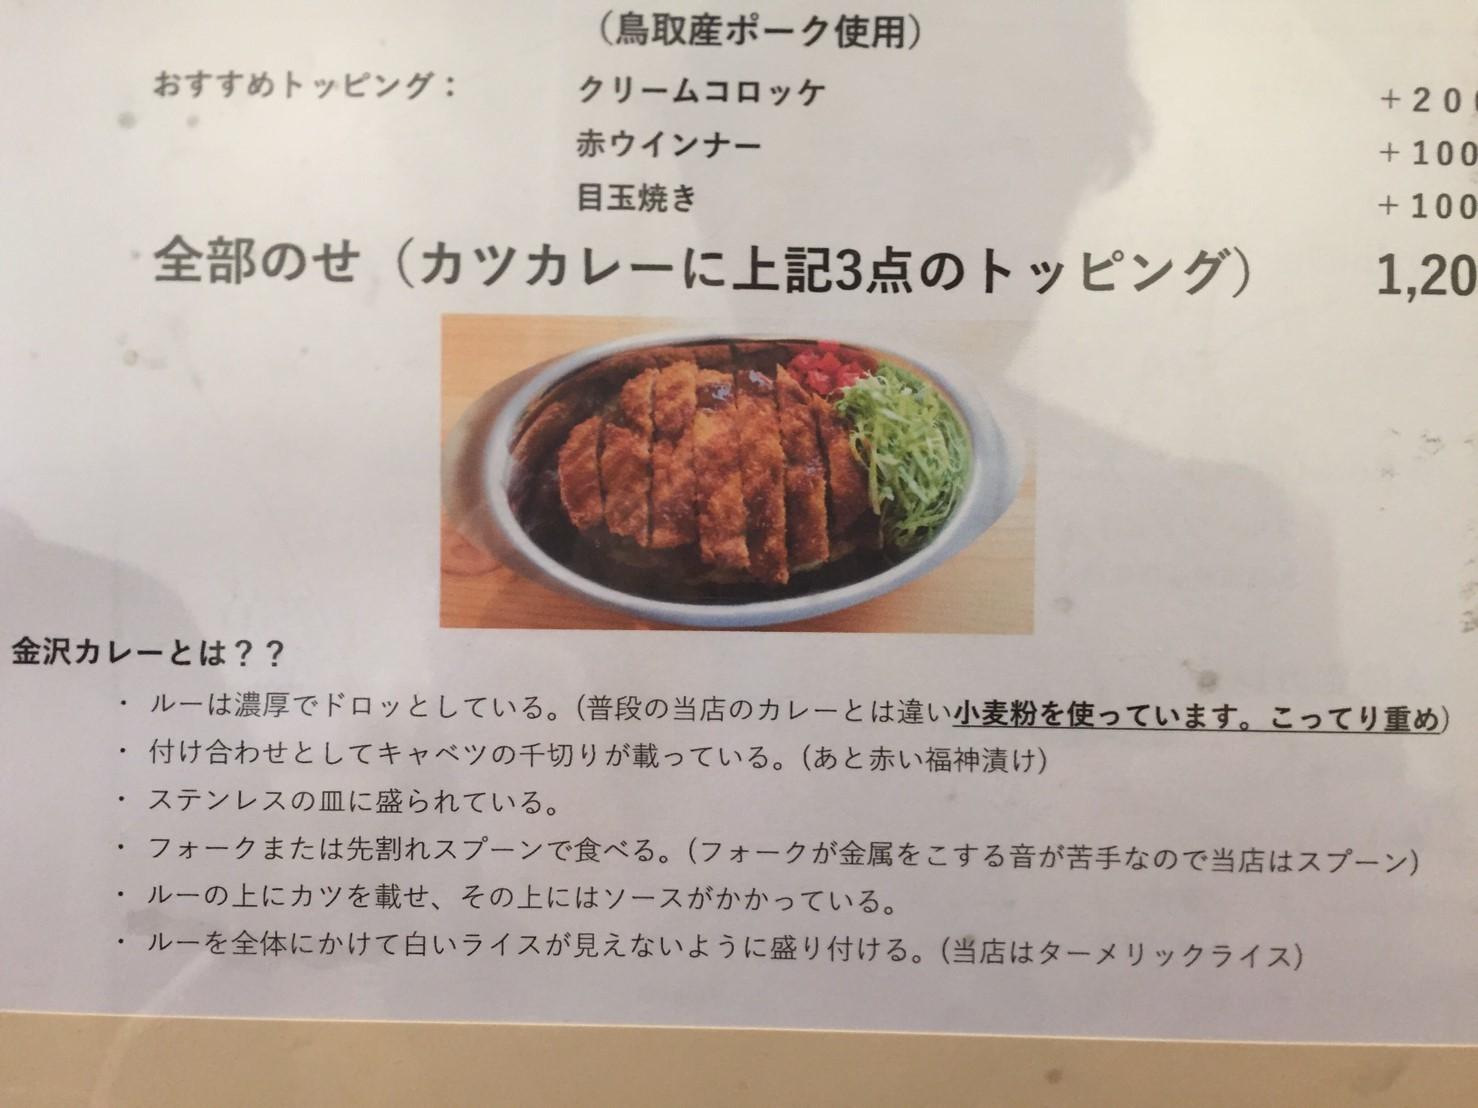 PARAKEET 限定カレー (金沢カレー風 ポークカツカレー)_e0115904_13112127.jpg